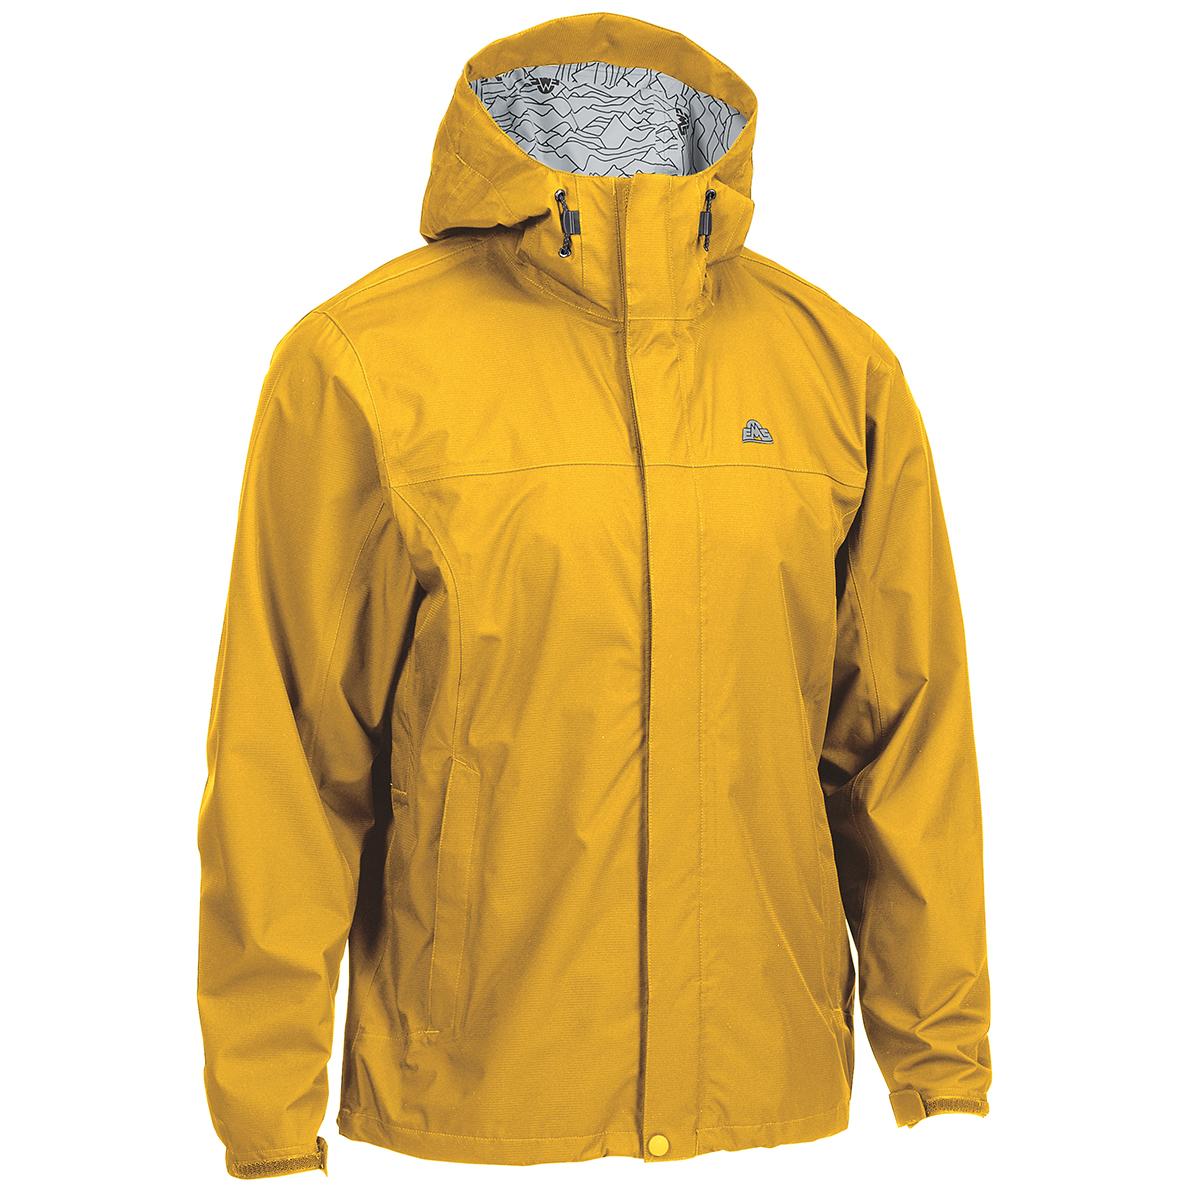 Ems Men's Thunderhead Peak Rain Jacket - Yellow, M